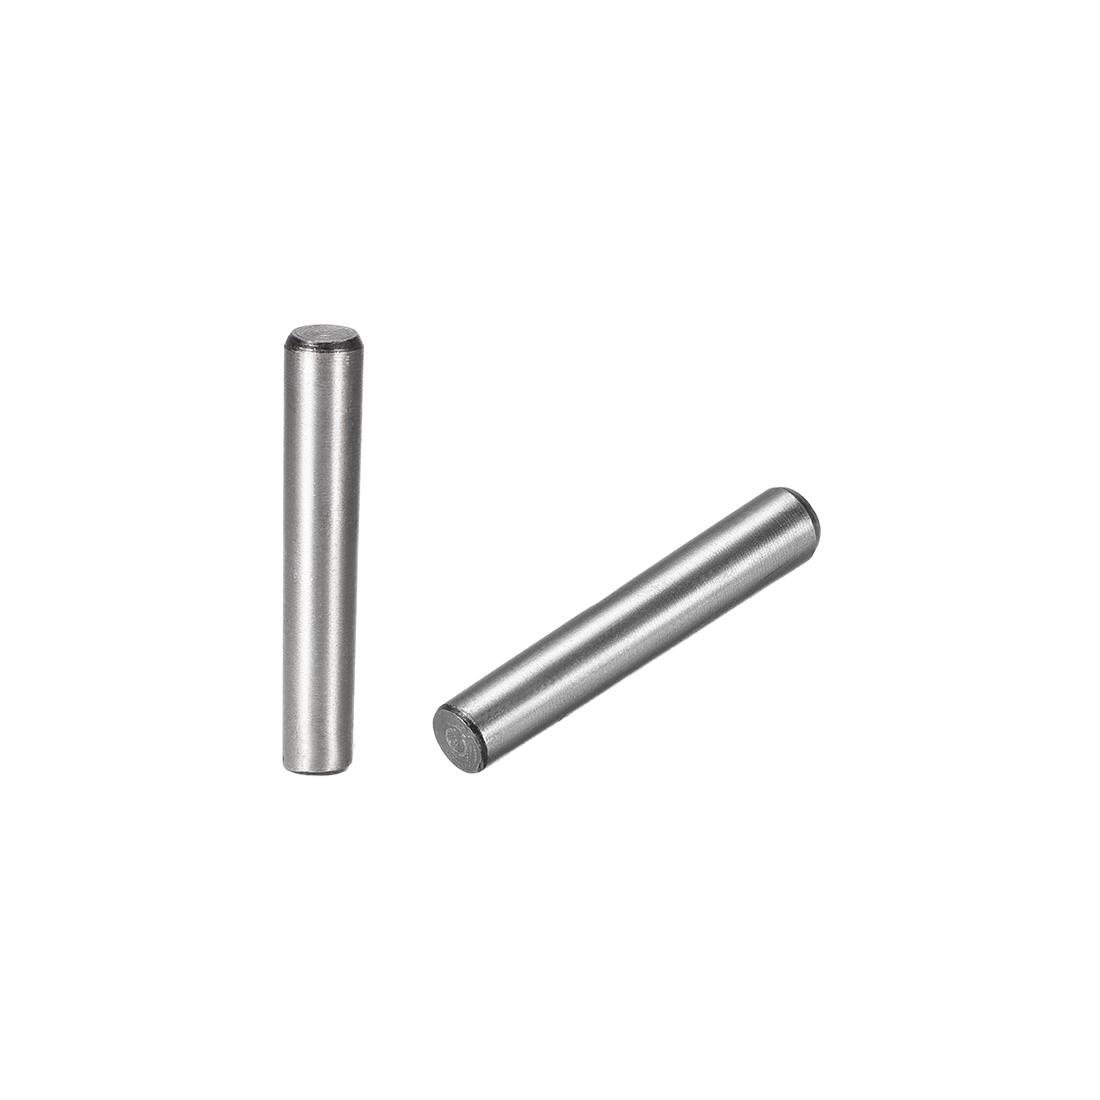 Carbon Steel GB117 50mm Length 8mmx8.9mm Small End Diameter 1:50 Taper Pin 2Pcs